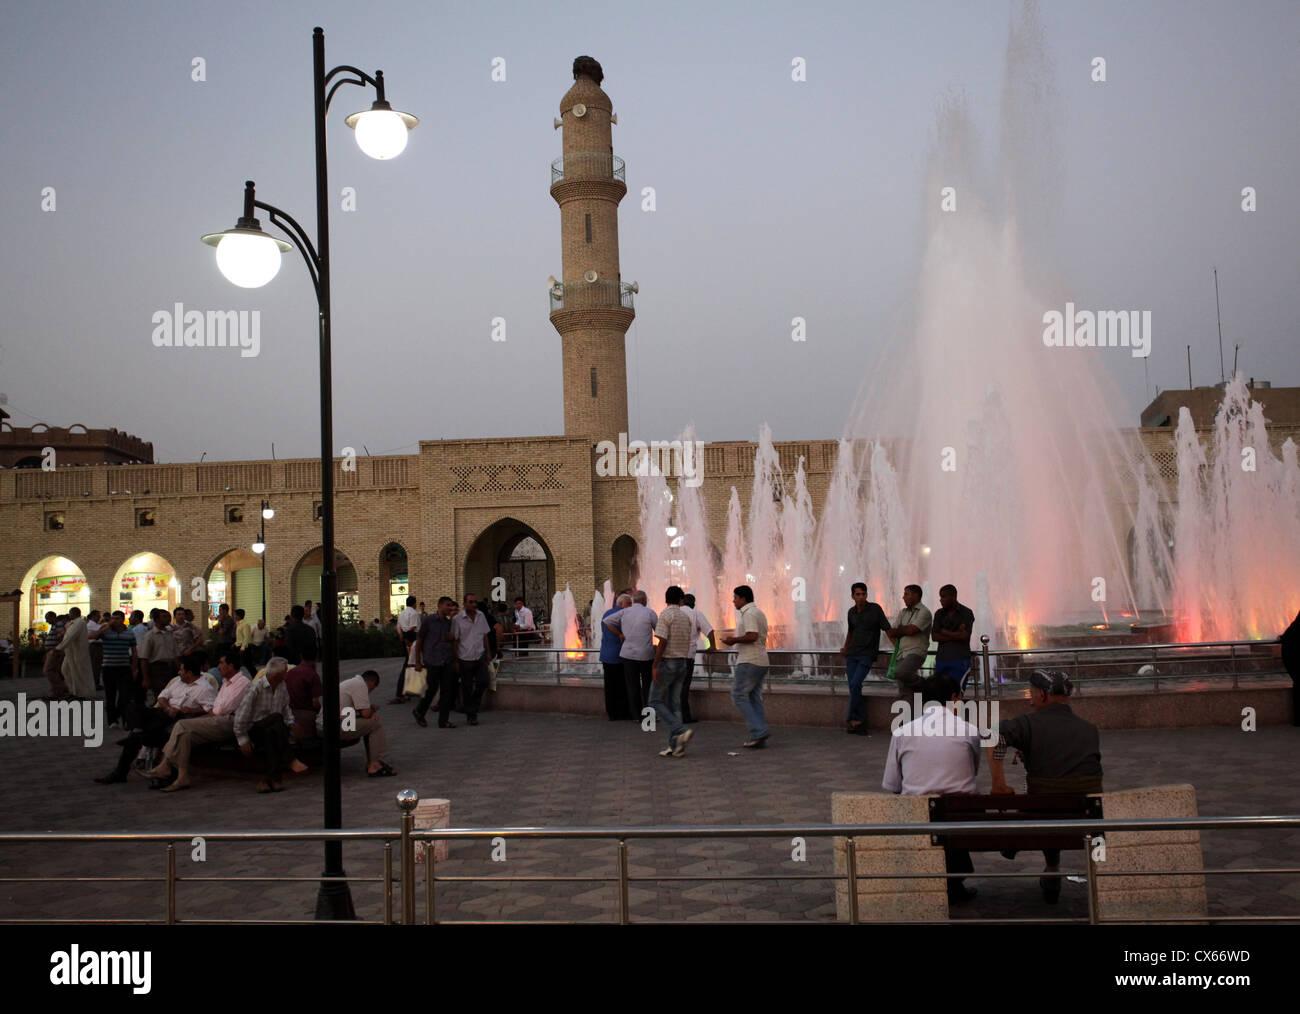 Evening at Shar Garden Square, Erbil, Iraq - Kurdistan - Stock Image